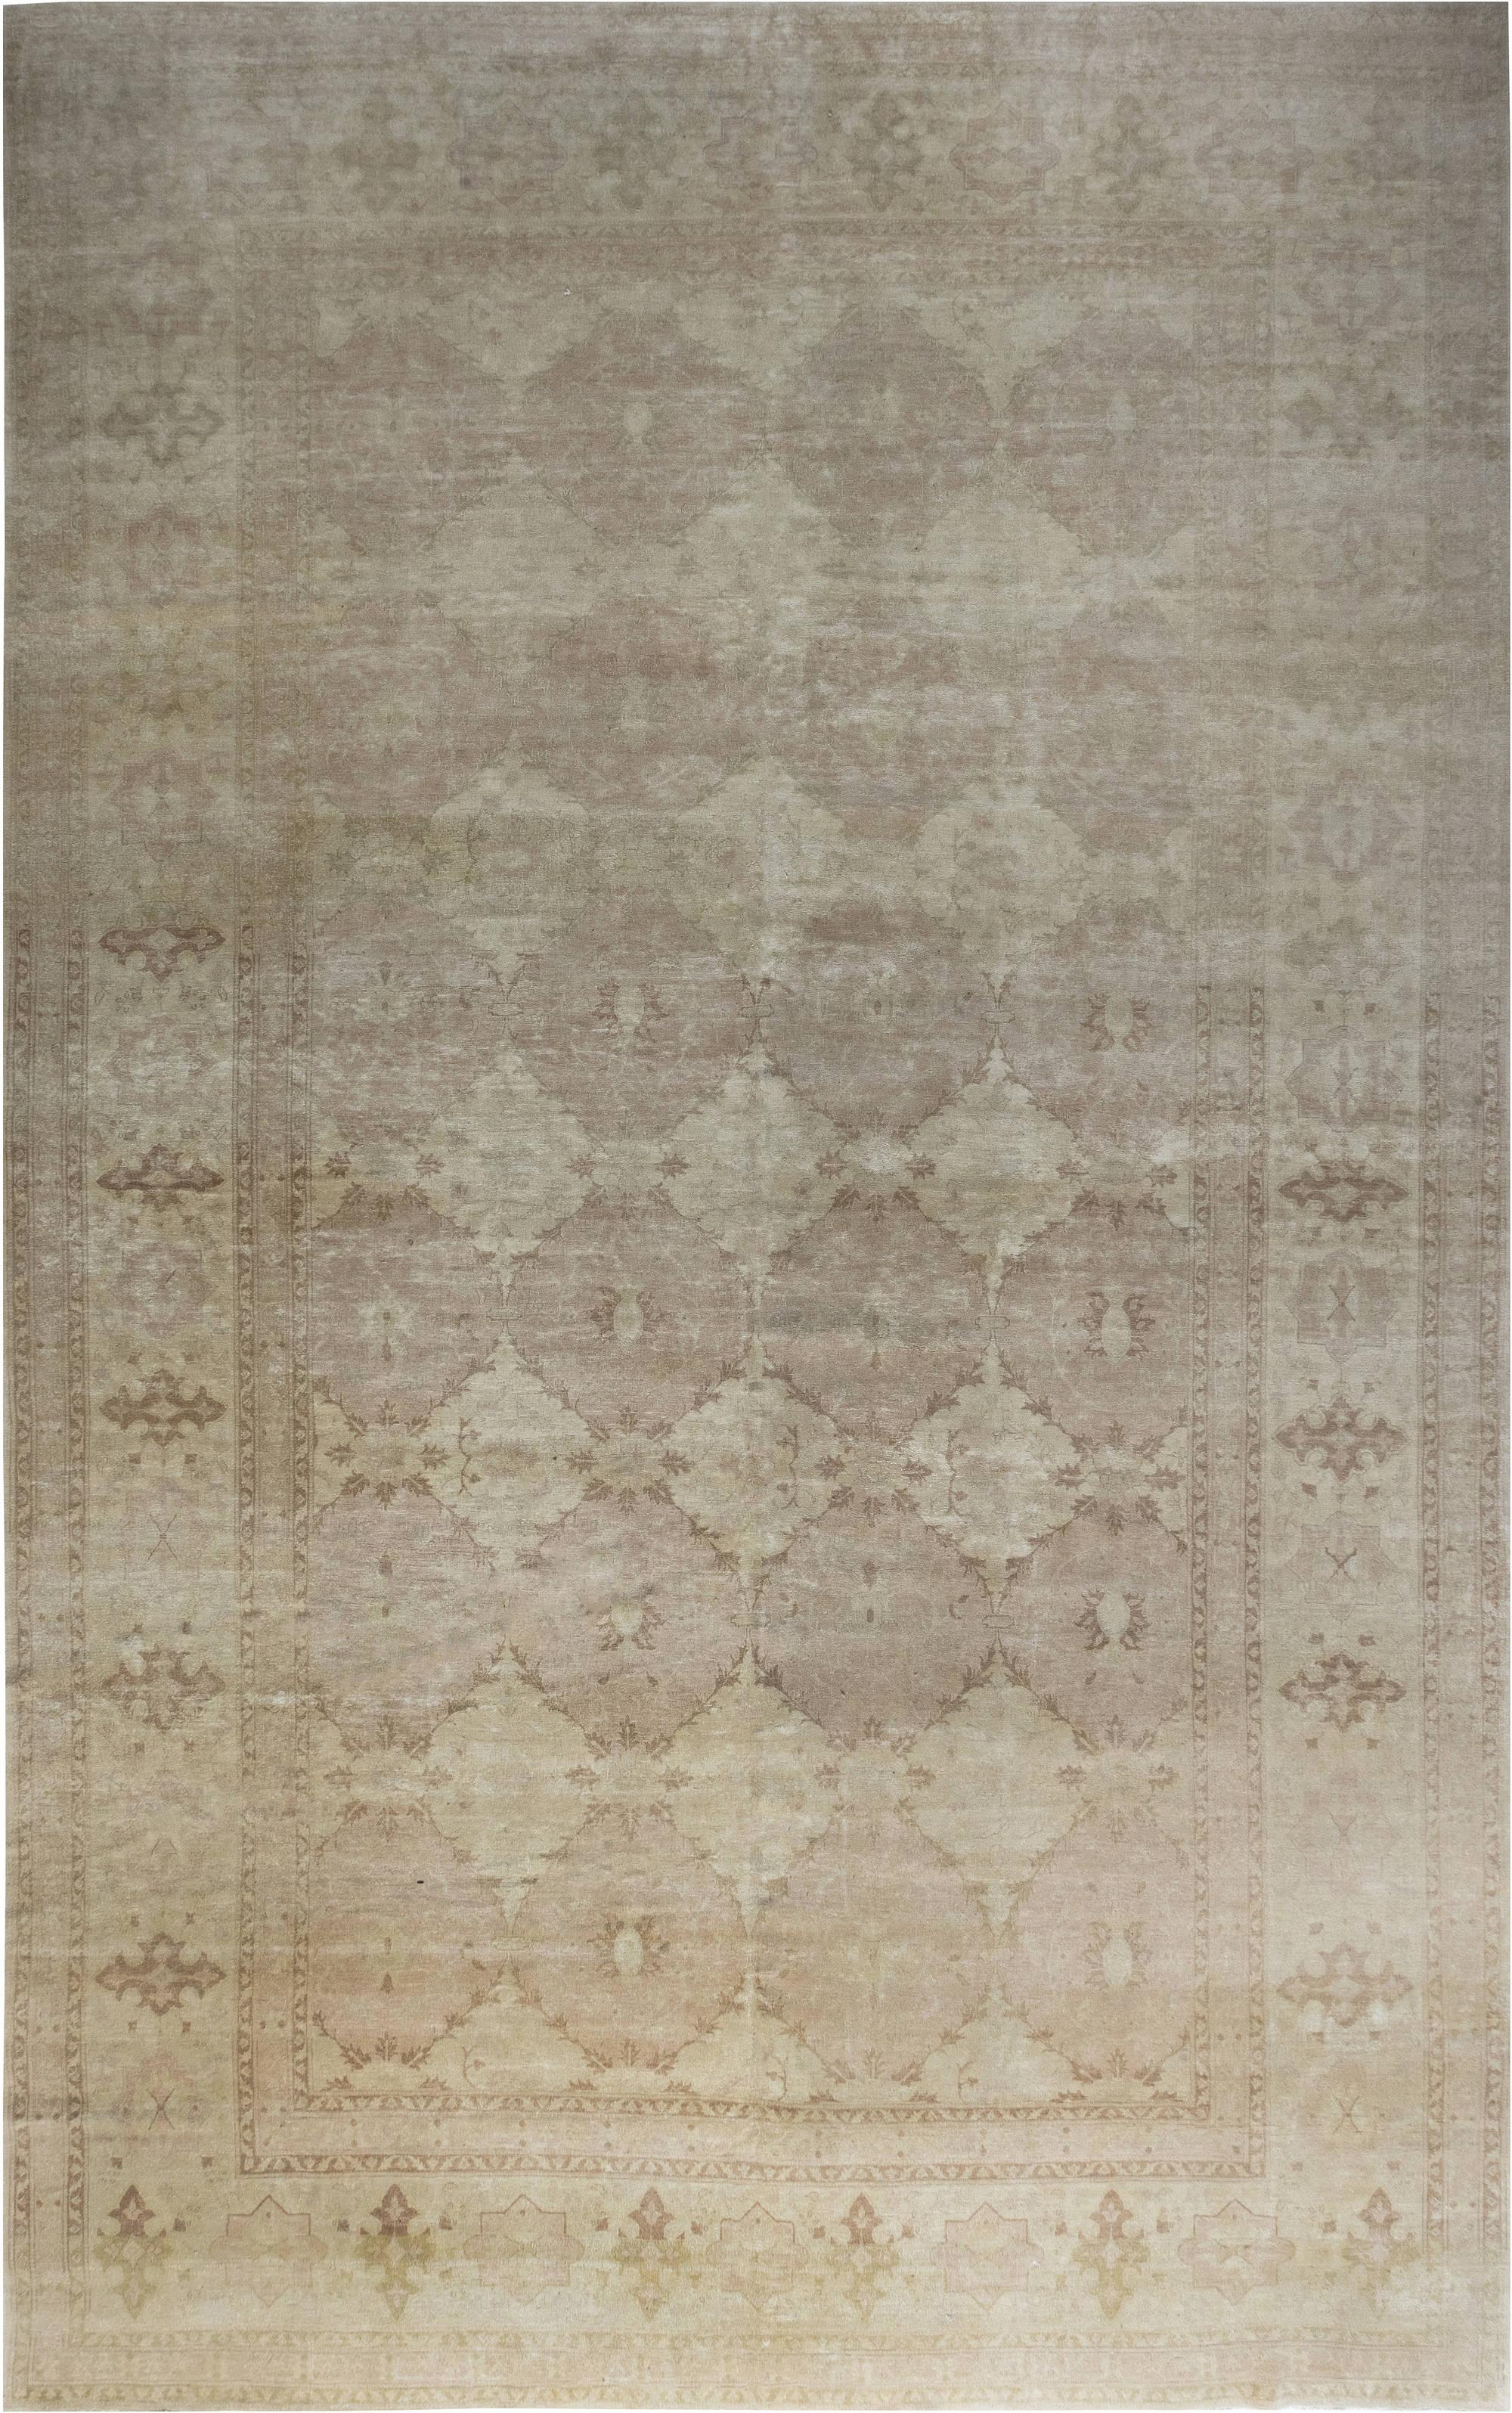 Traditional inspired Tabriz Rug. N11759